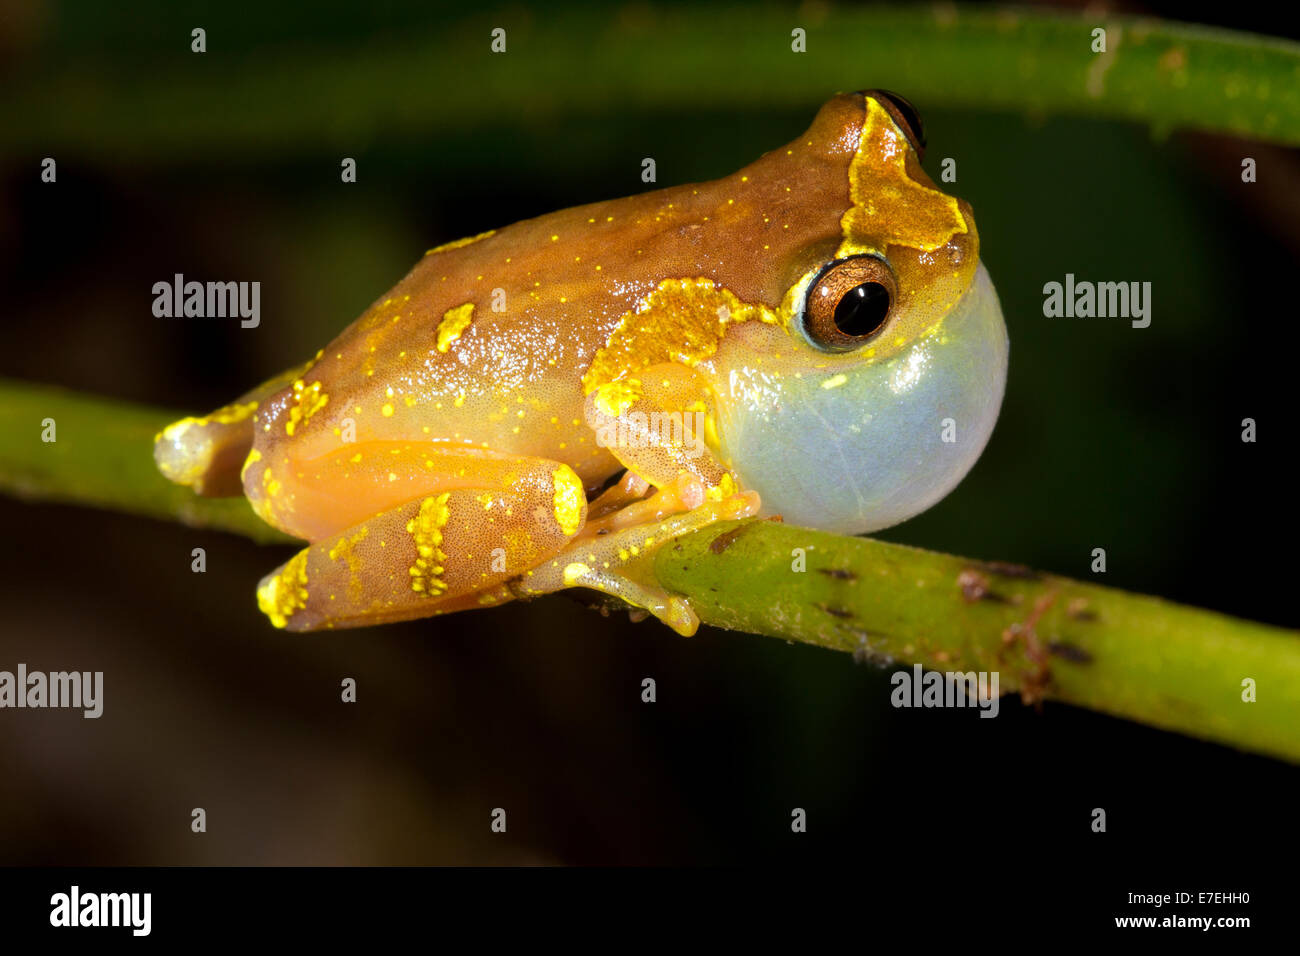 Sarayacu Treefrog (Dendropsophus sarayacuensis). Male calling. - Stock Image